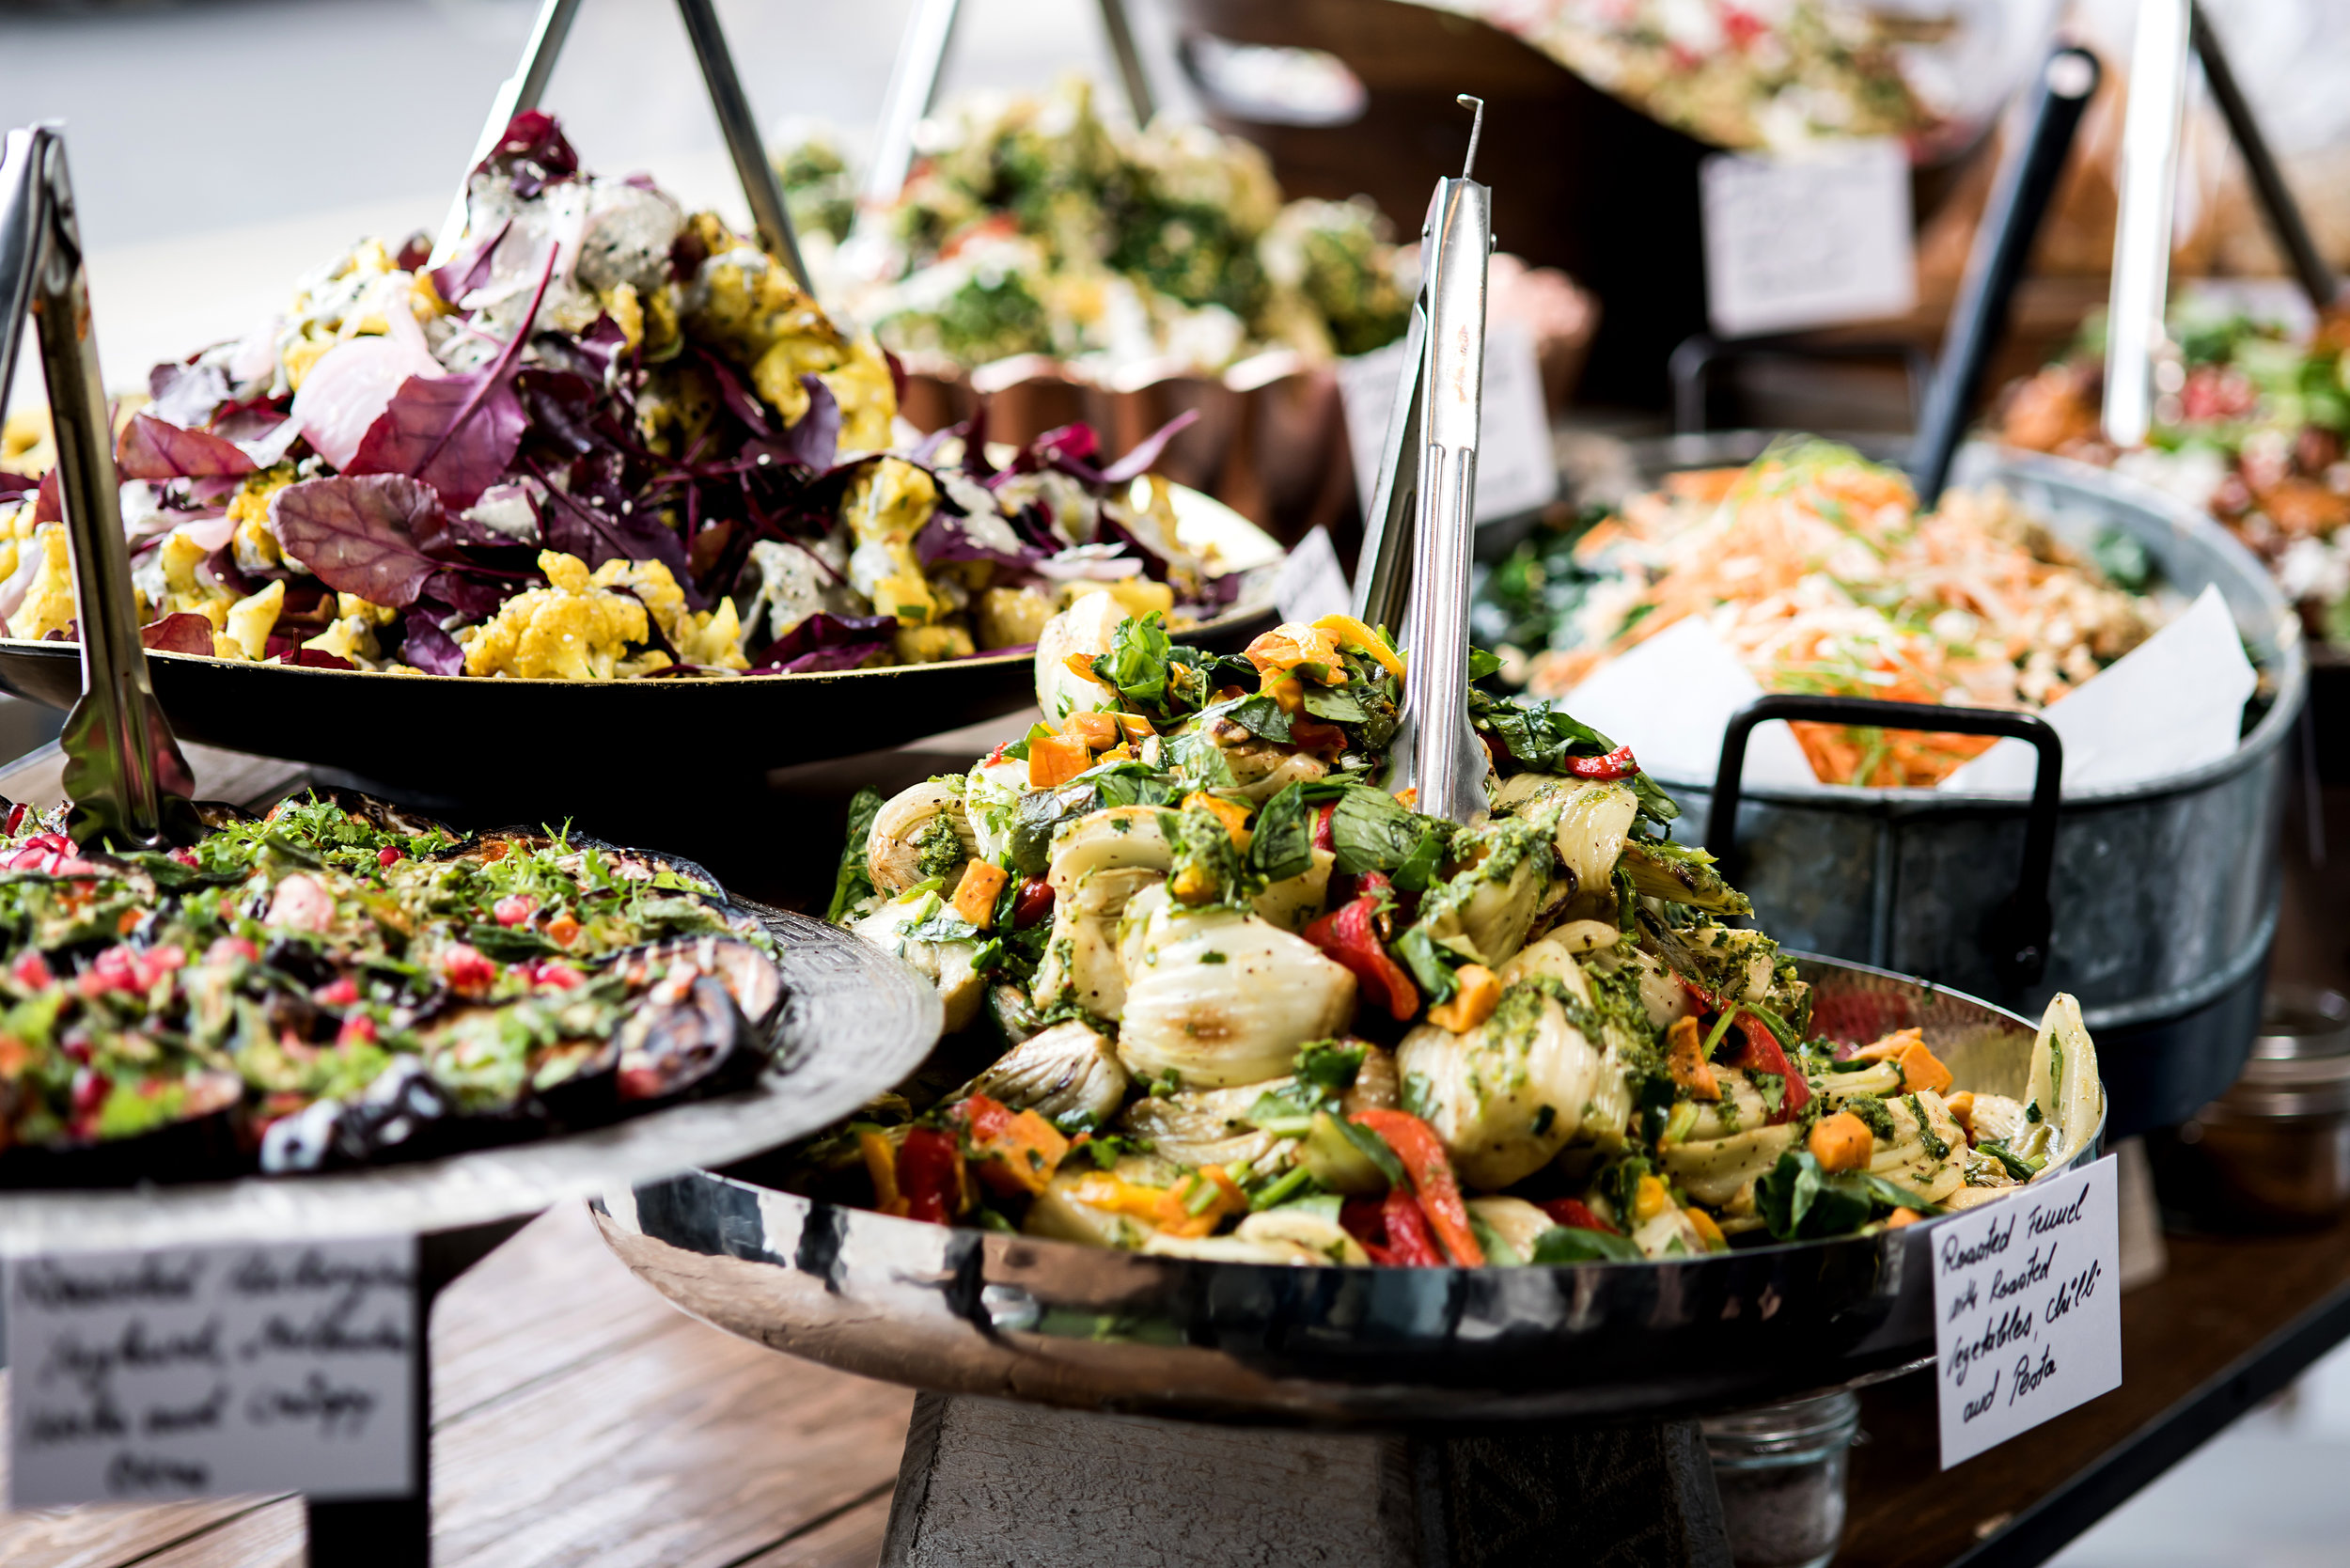 Feed-5000-hot-mixed-buffet-menu-header